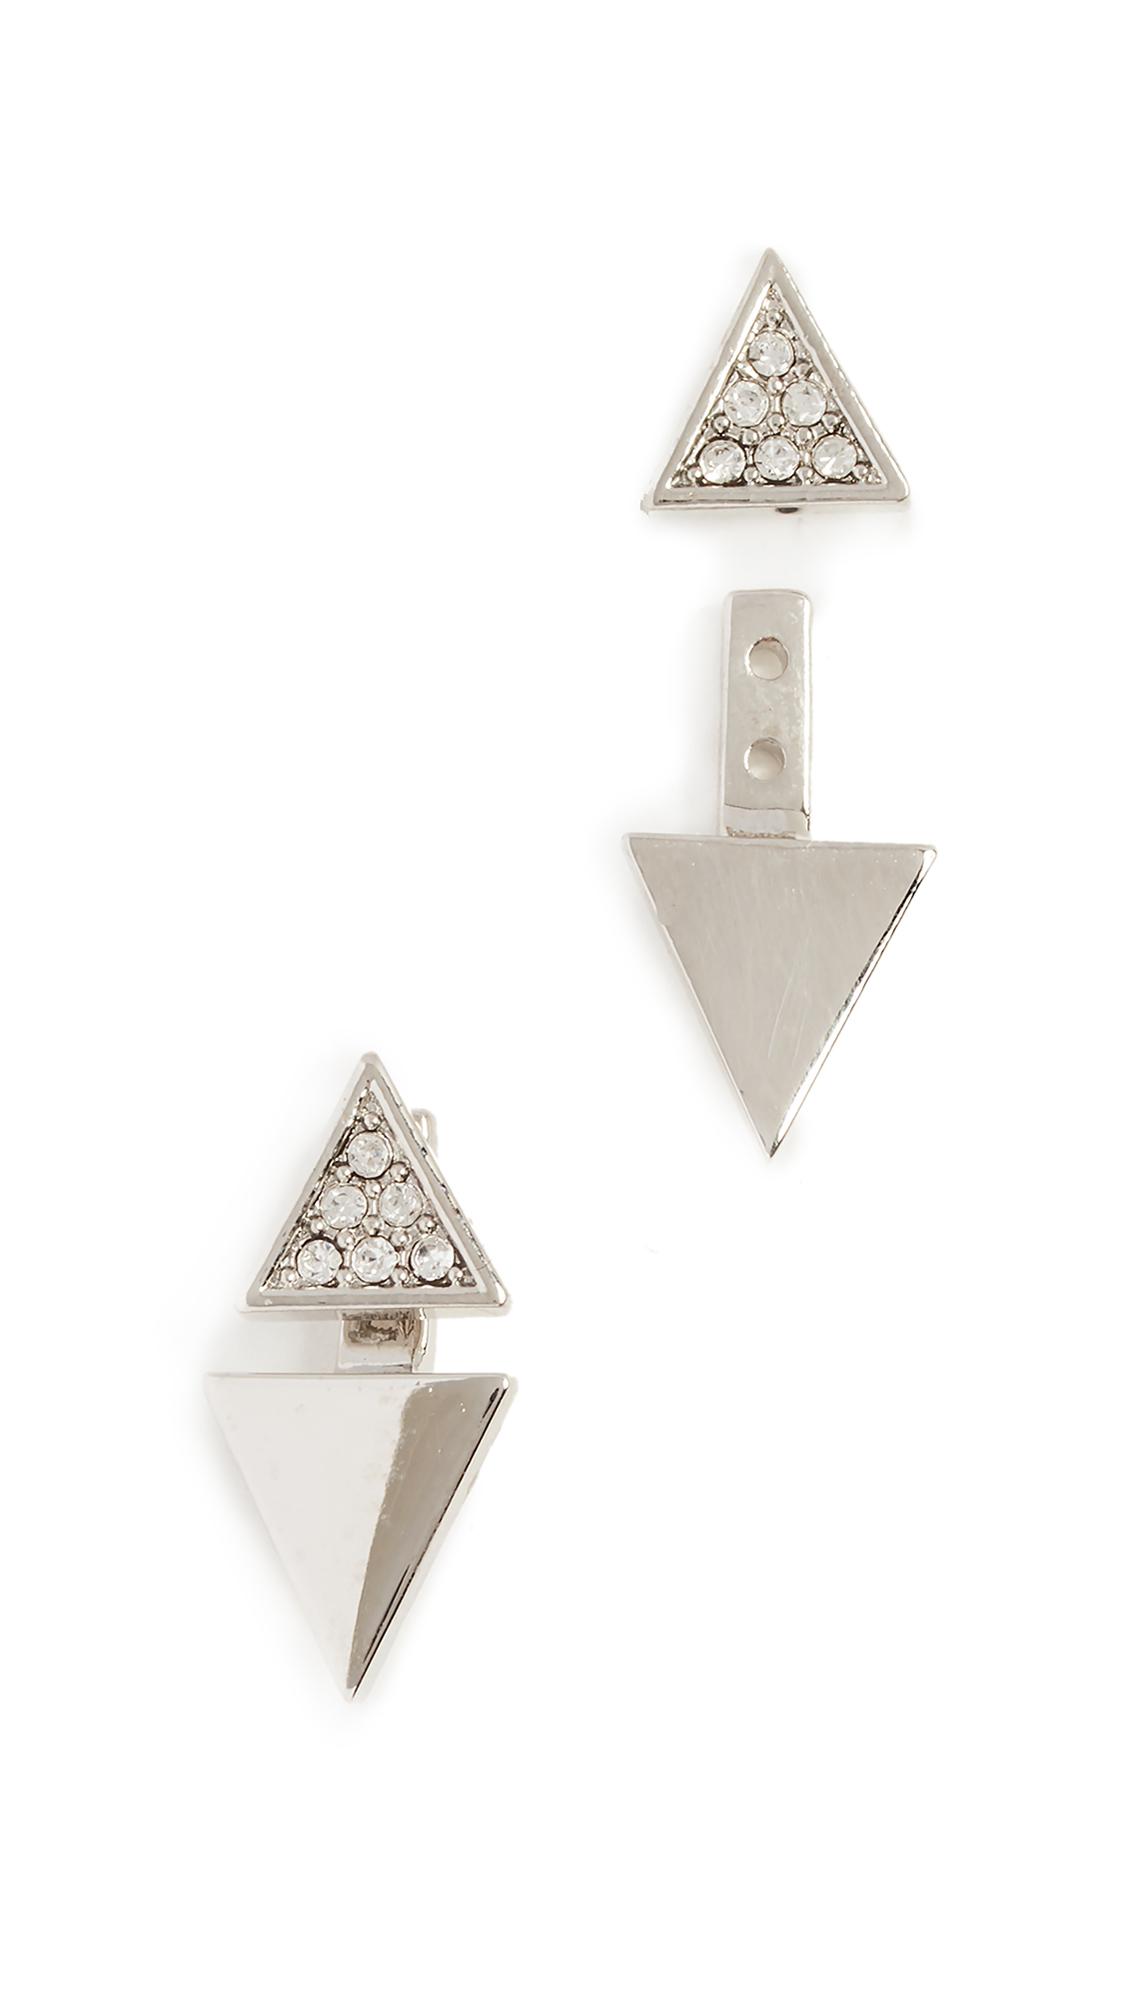 Rebecca Minkoff Double Triangle Earrings - Silver/Clear